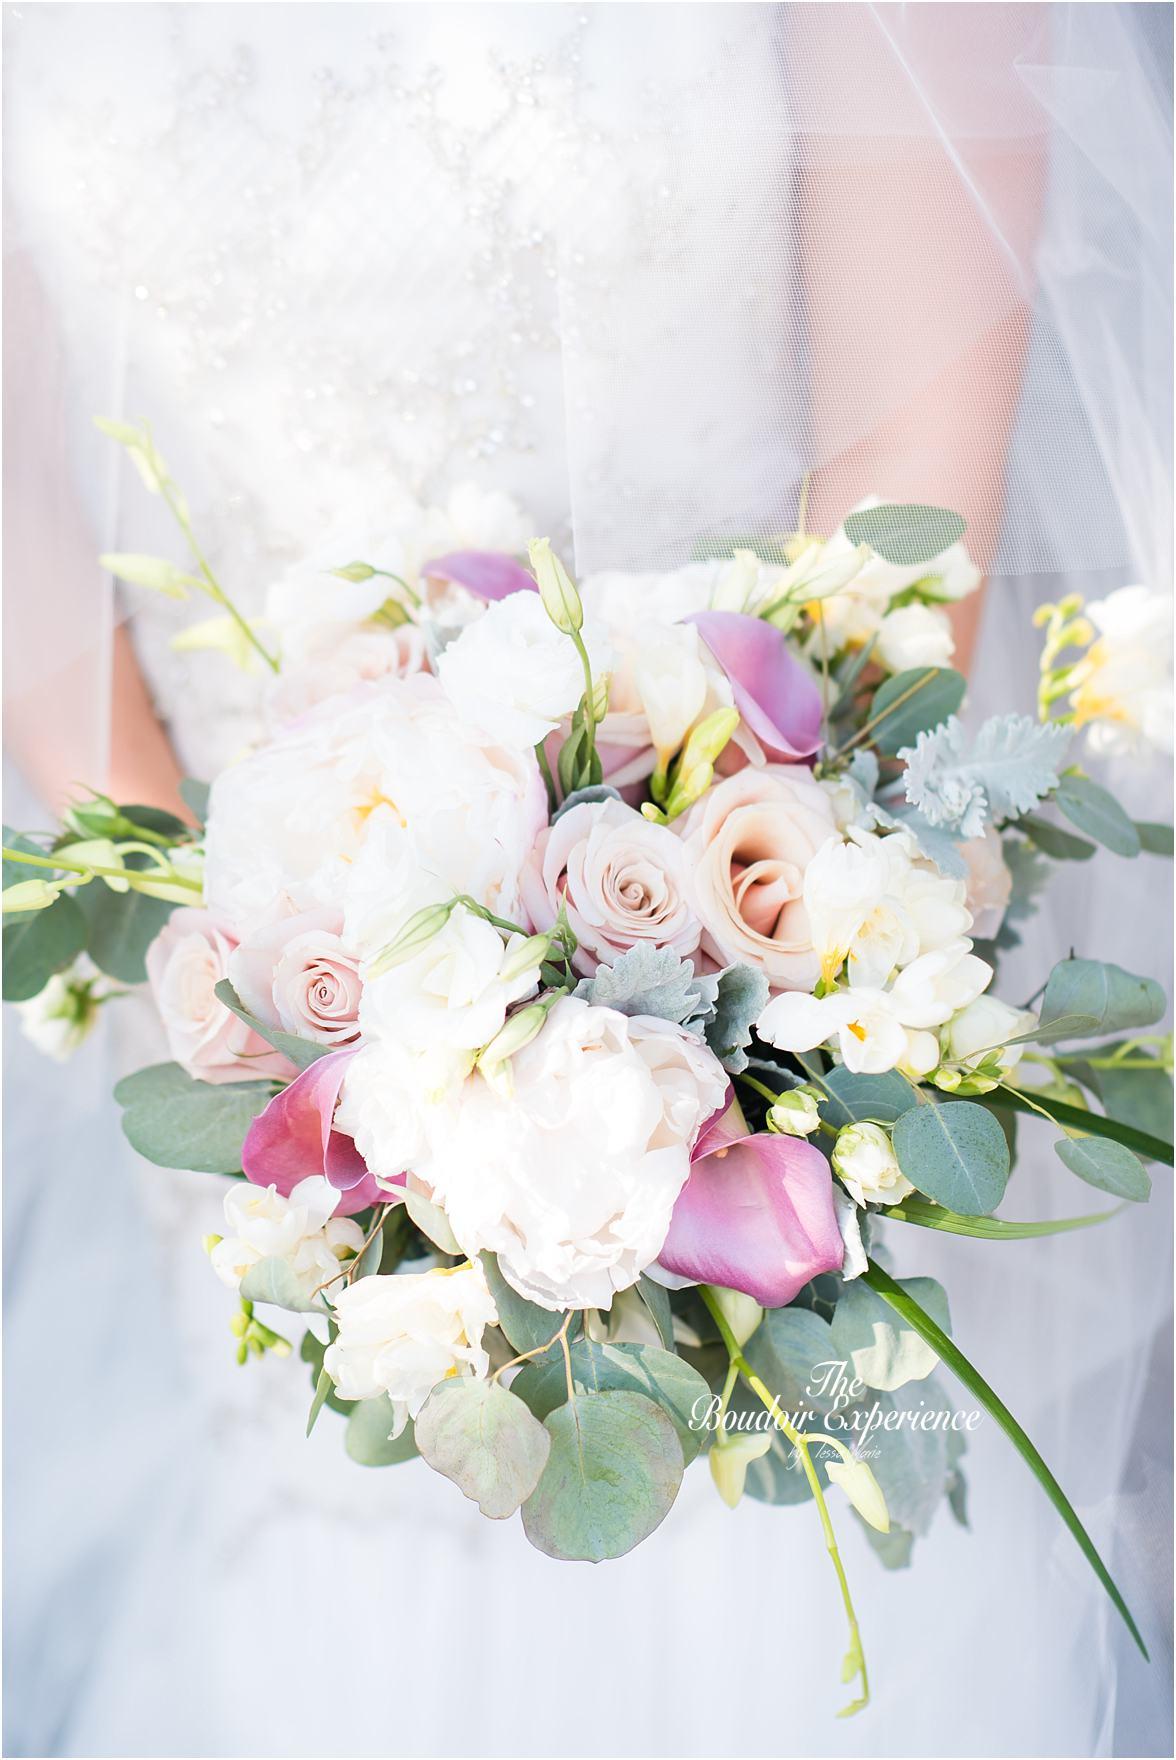 lake_lanier_wedding_summer_pictures_legacy_moments_family_candid_atlantas_best_wedding_photographer_tessa_marie_weddings_lake_lanier_bride_out_door_wedding_0001